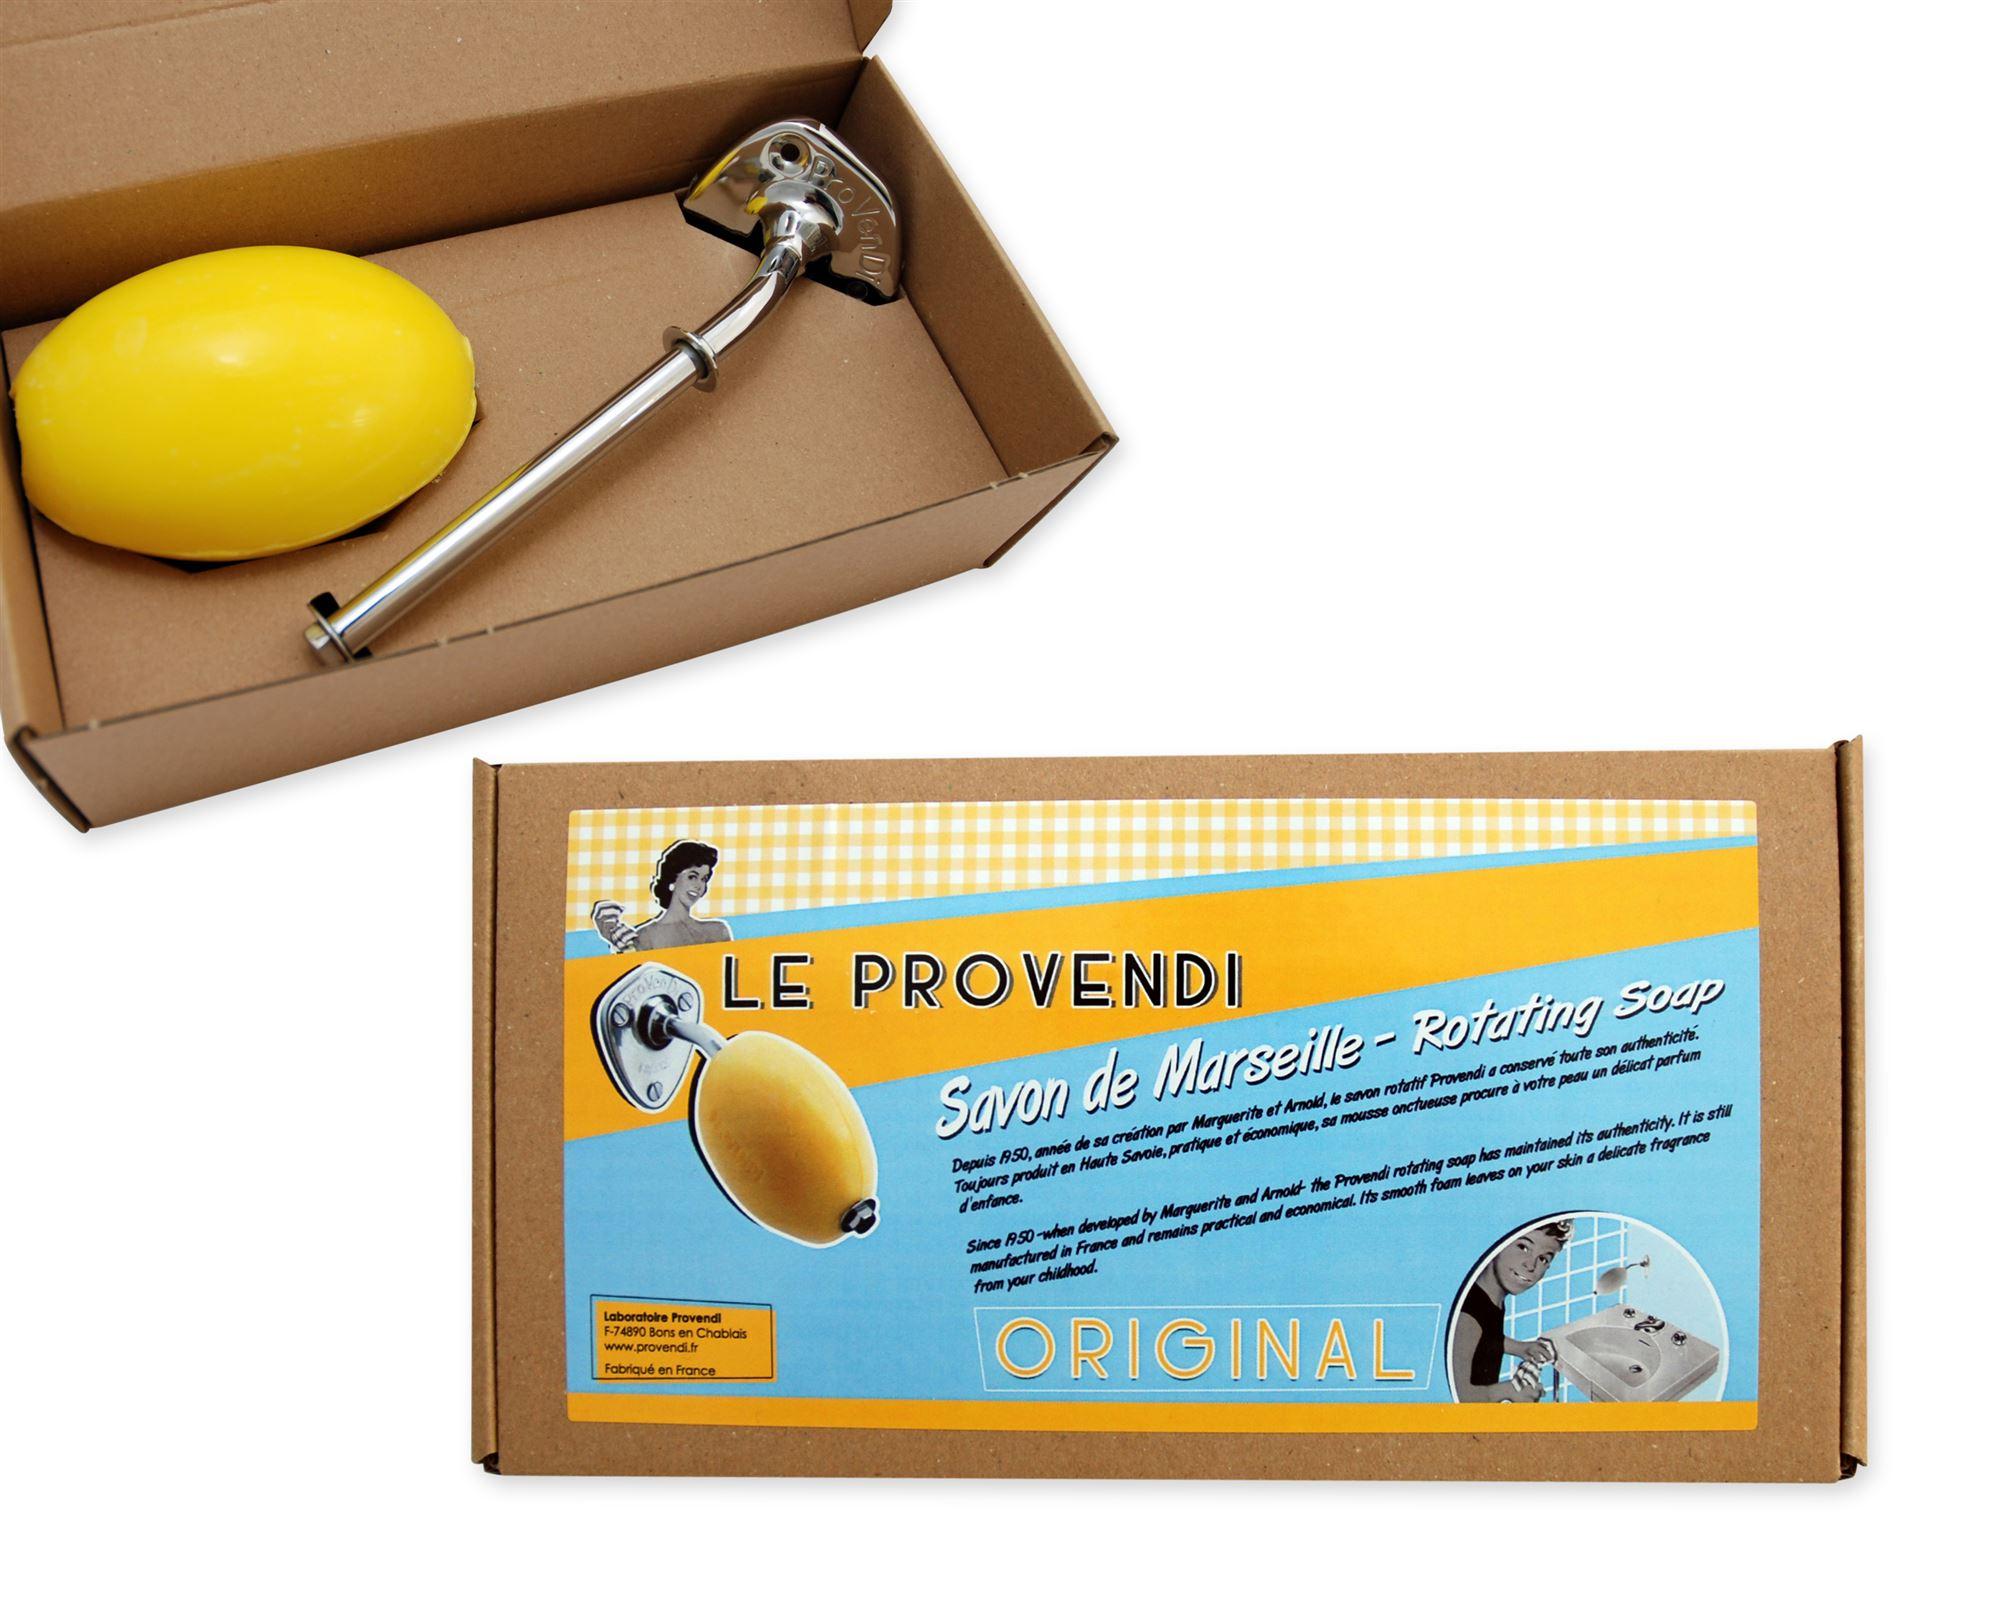 Créer Son Porte Savon provendi porte savon avec savon citron a vis